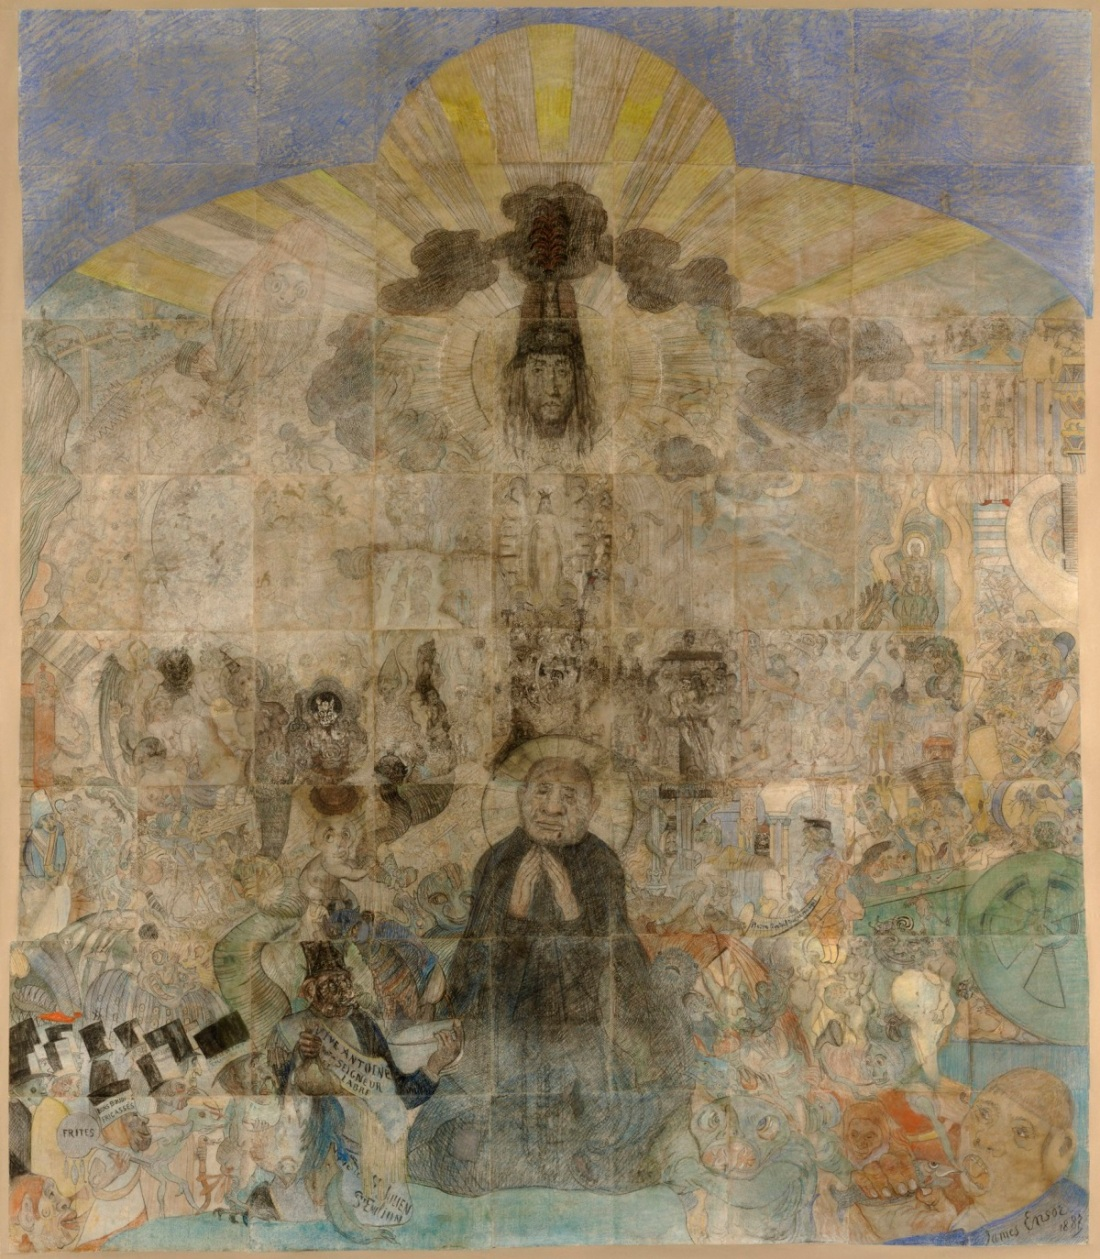 James Ensor, The Temptation of St. Anthony, 1887.